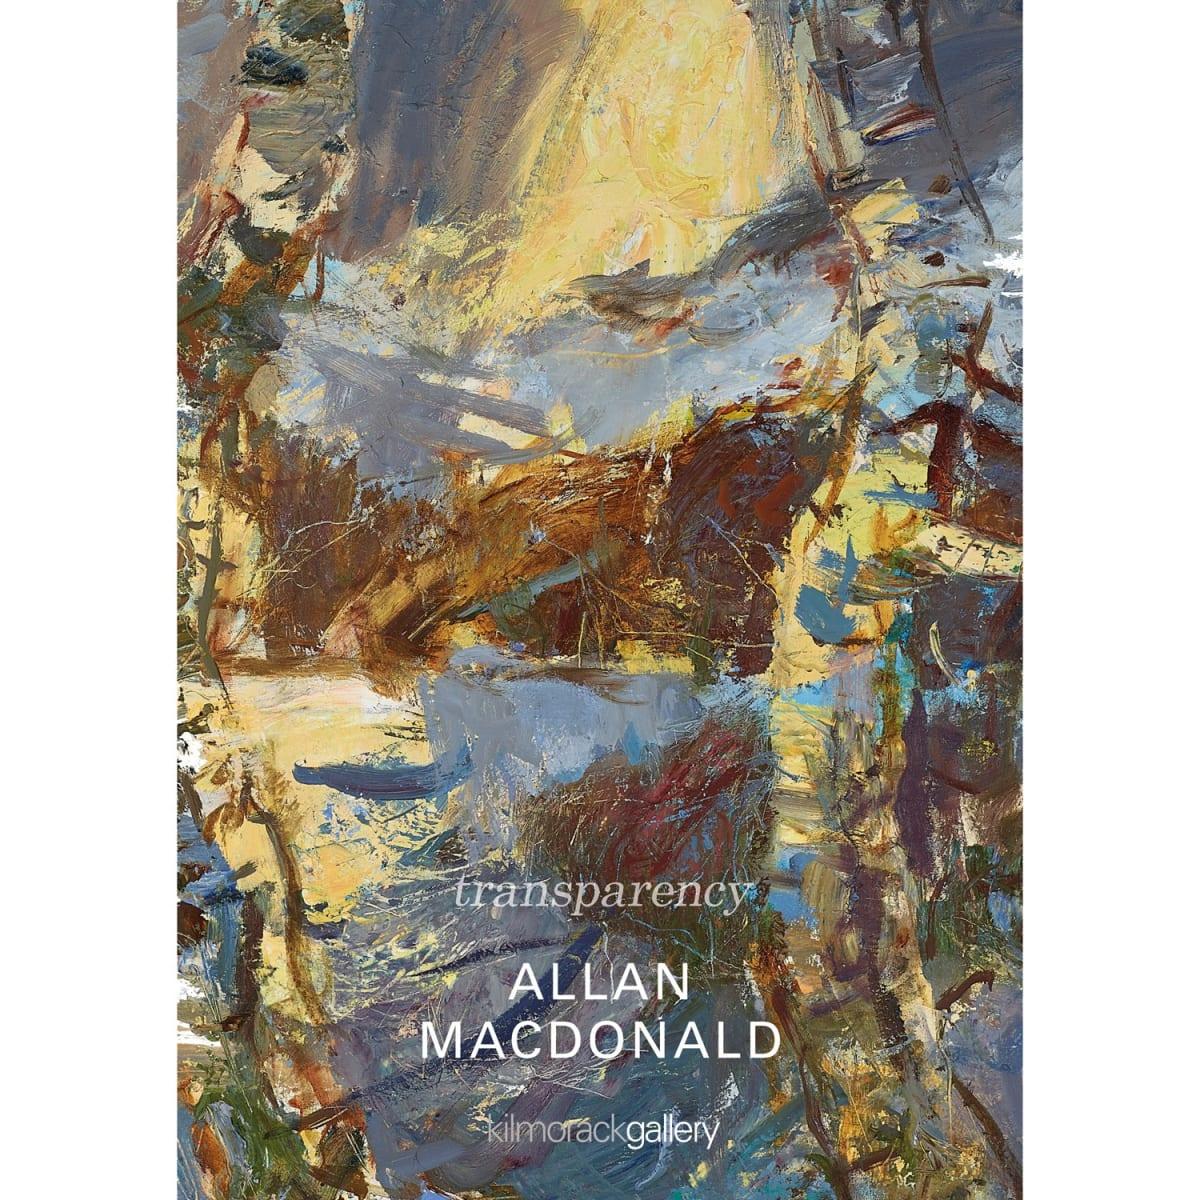 ALLAN MACDONALD